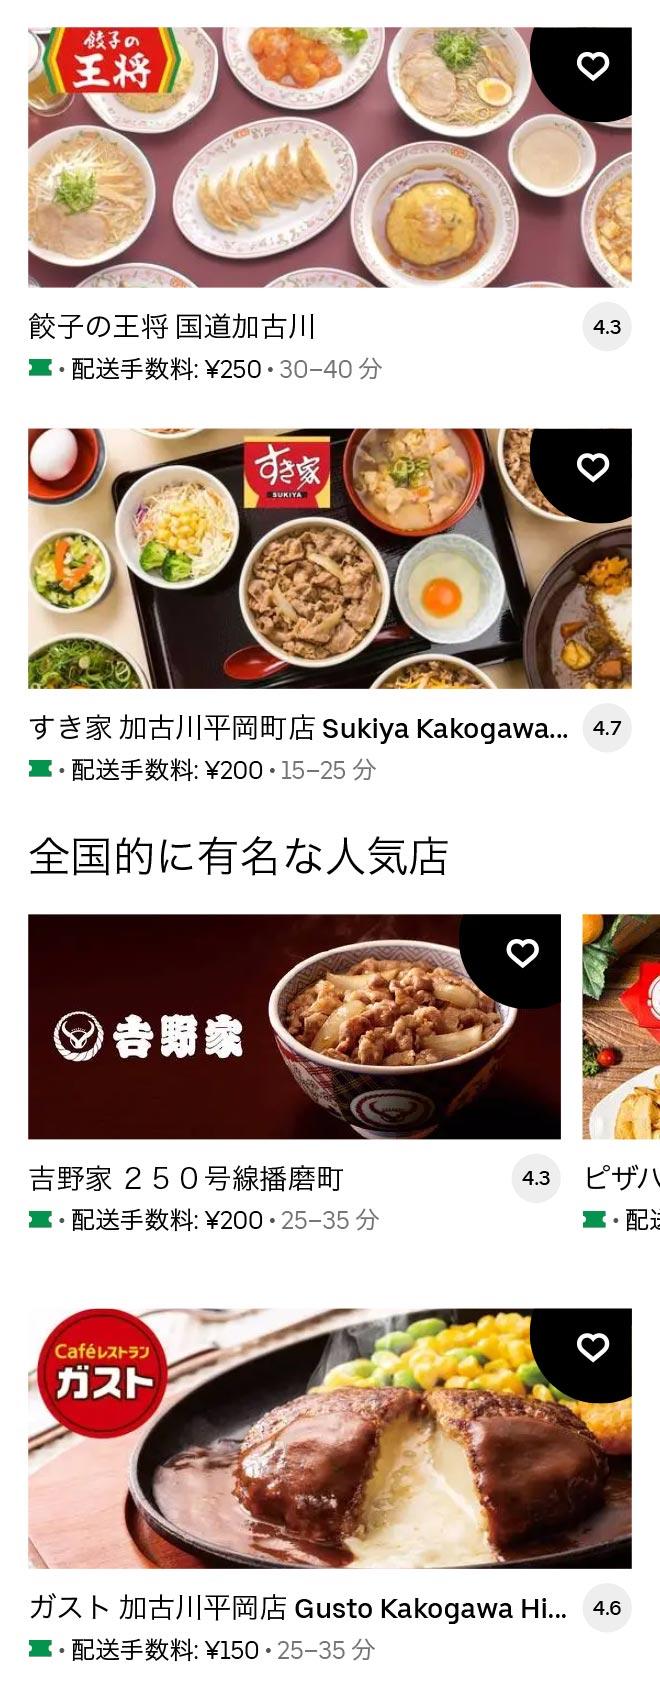 U kakogawa befu 2102 03